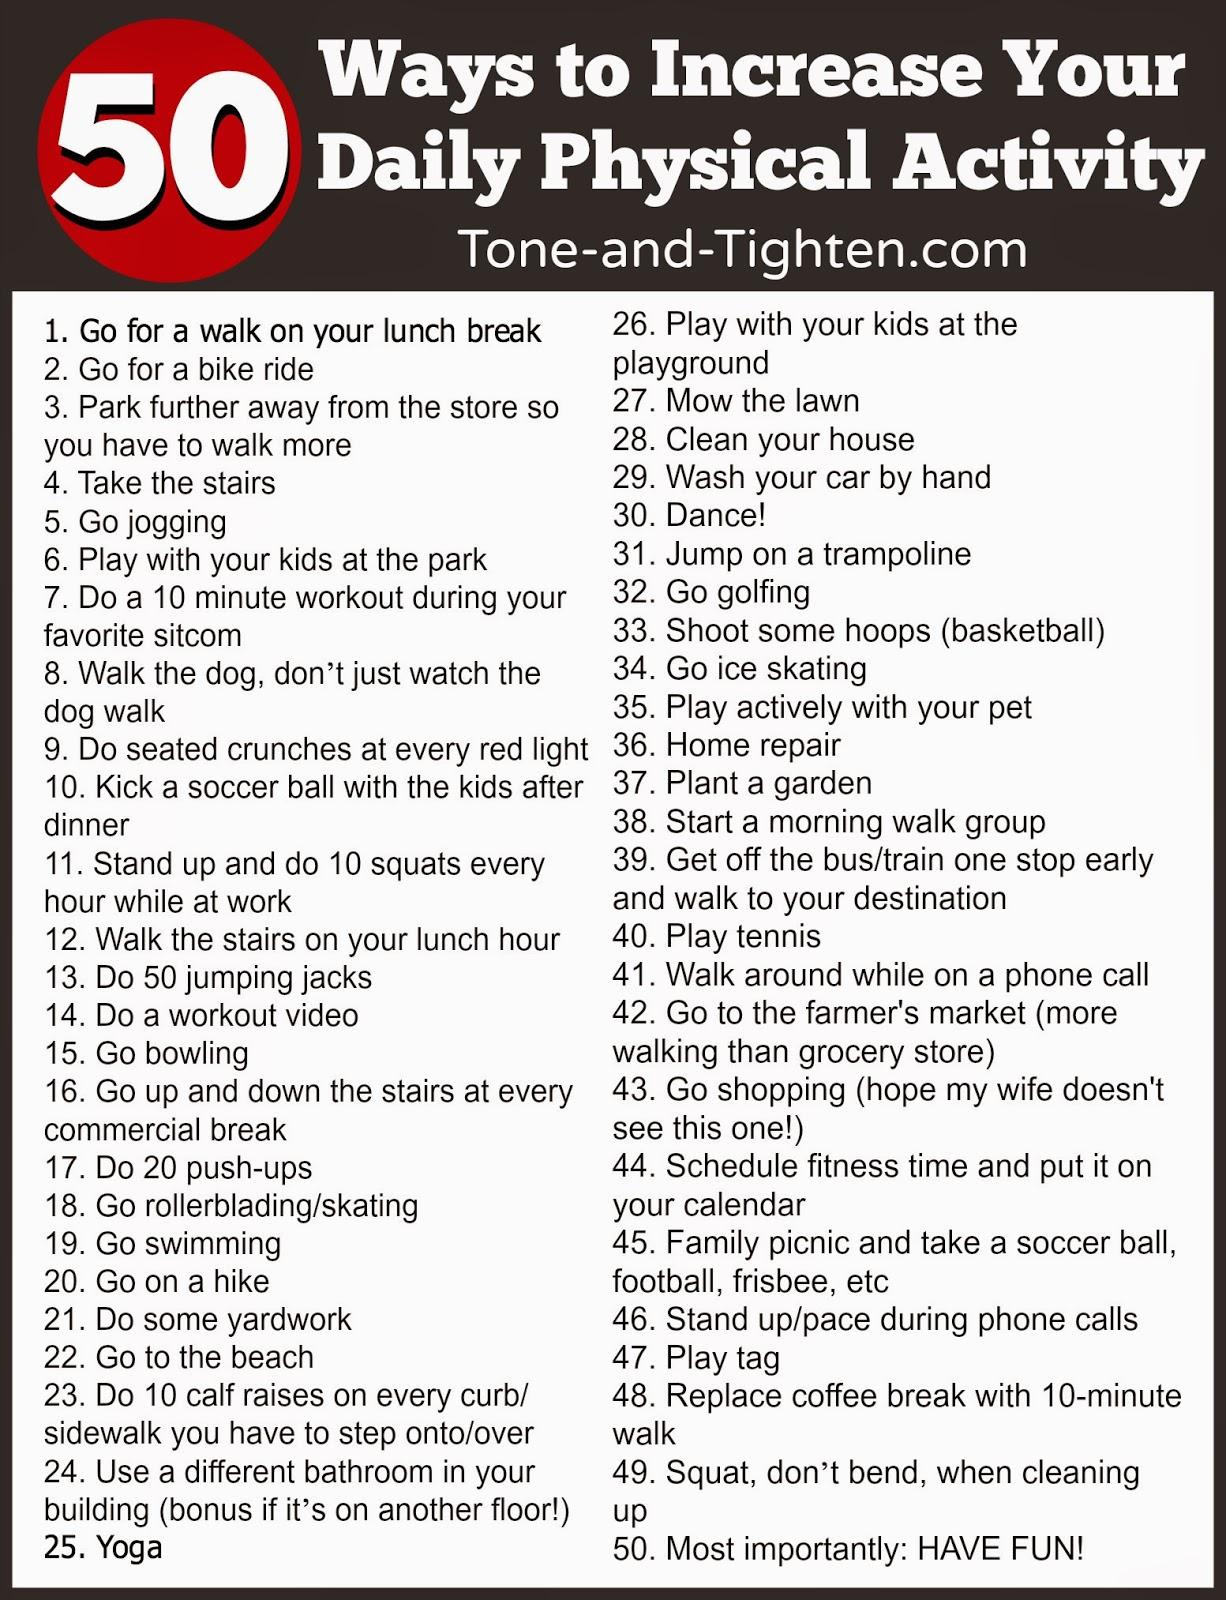 50 Simple Ways To Get Healthier